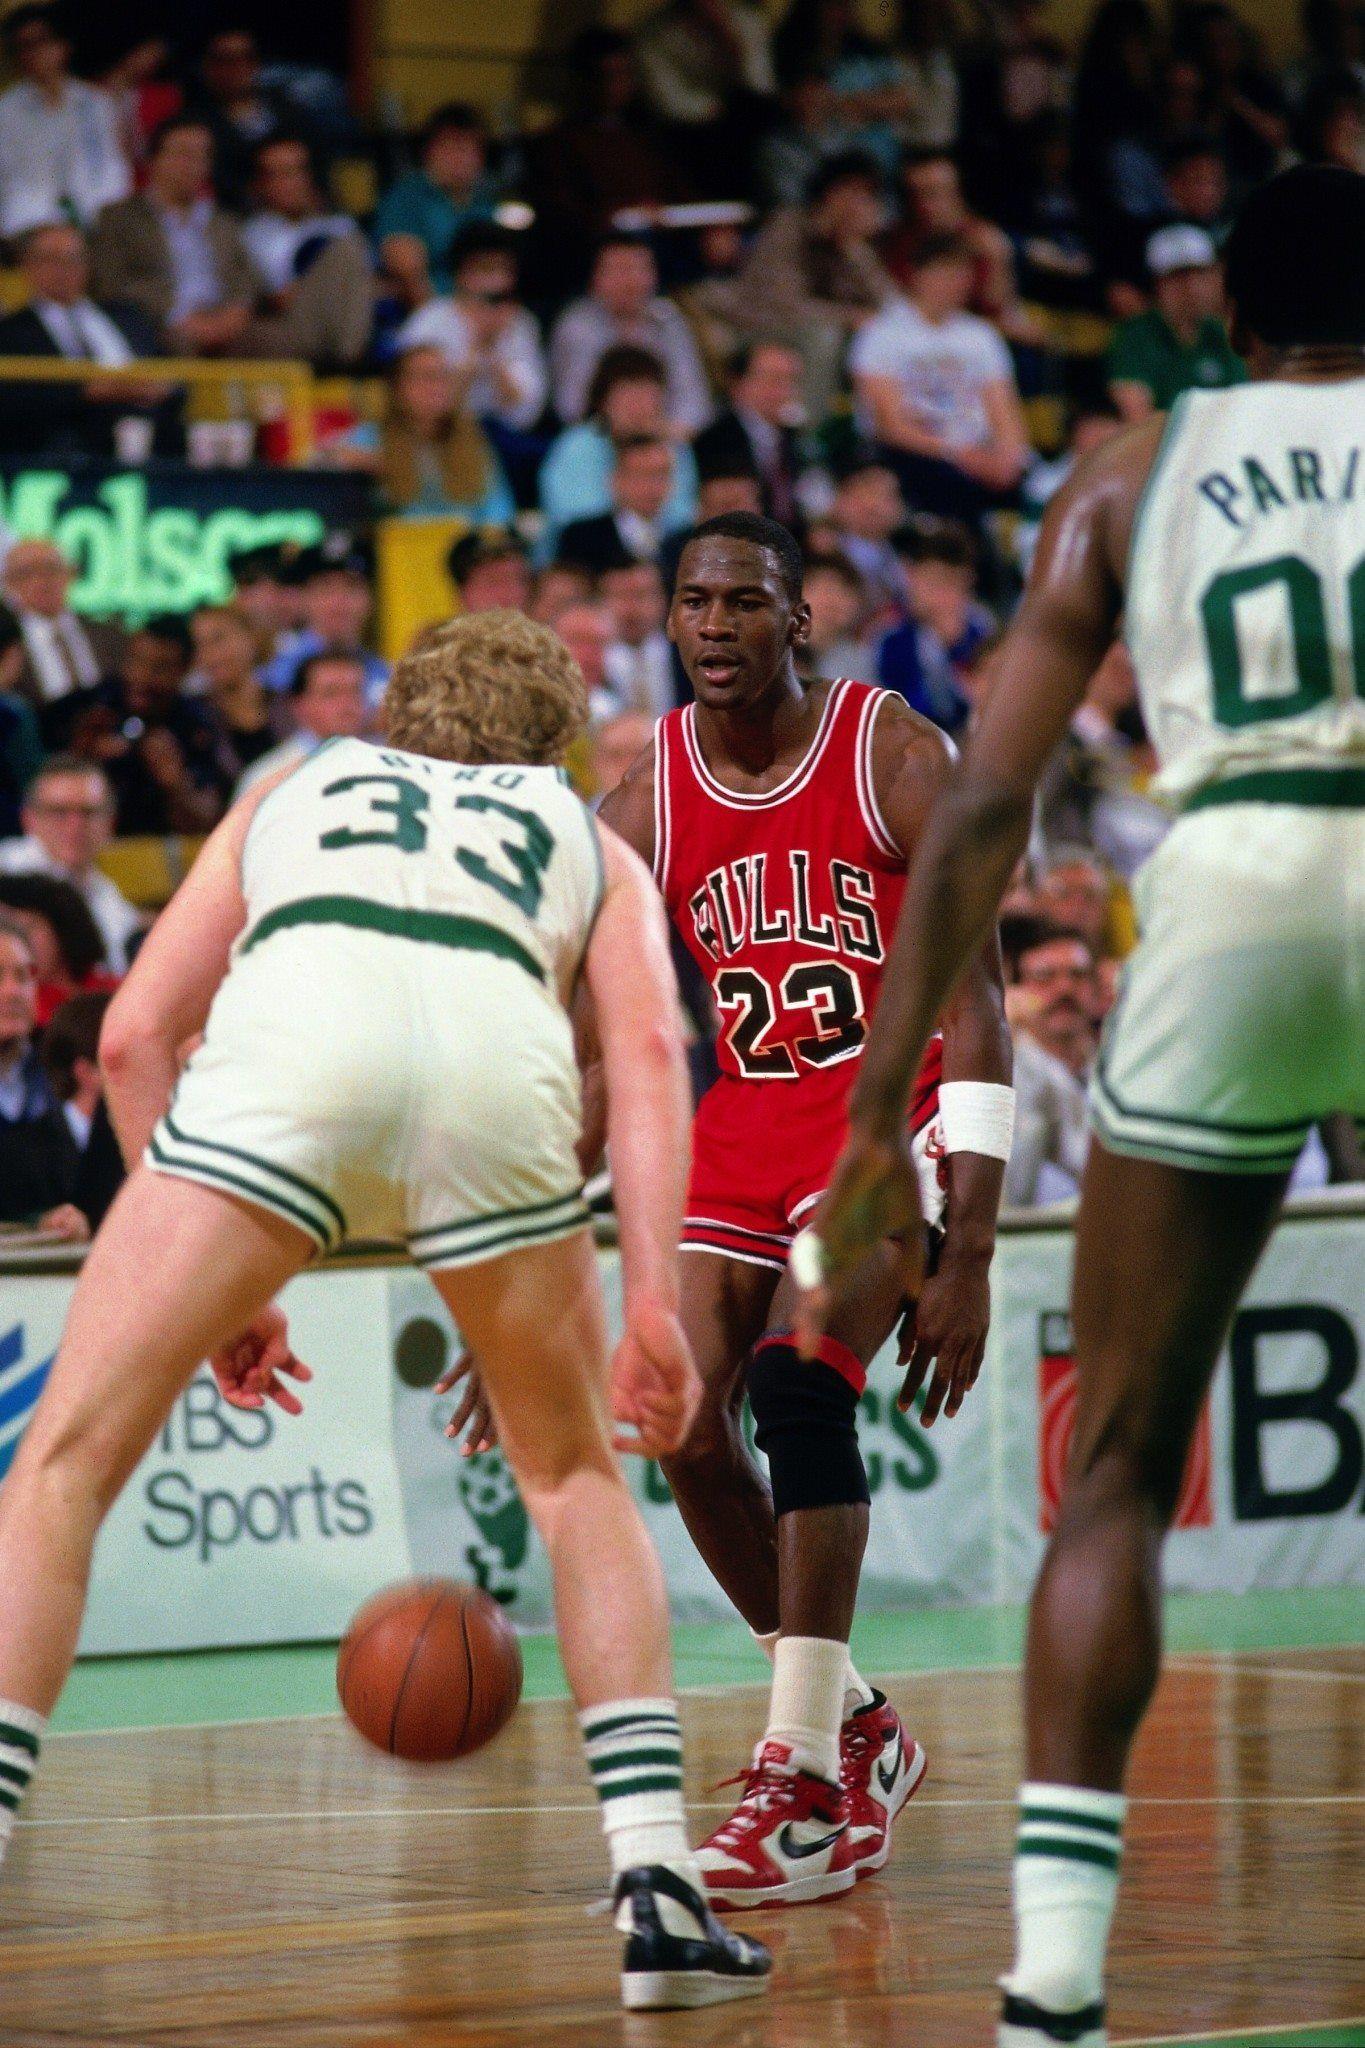 Pin by Japheth on NBA | Michael jordan pictures, Michael